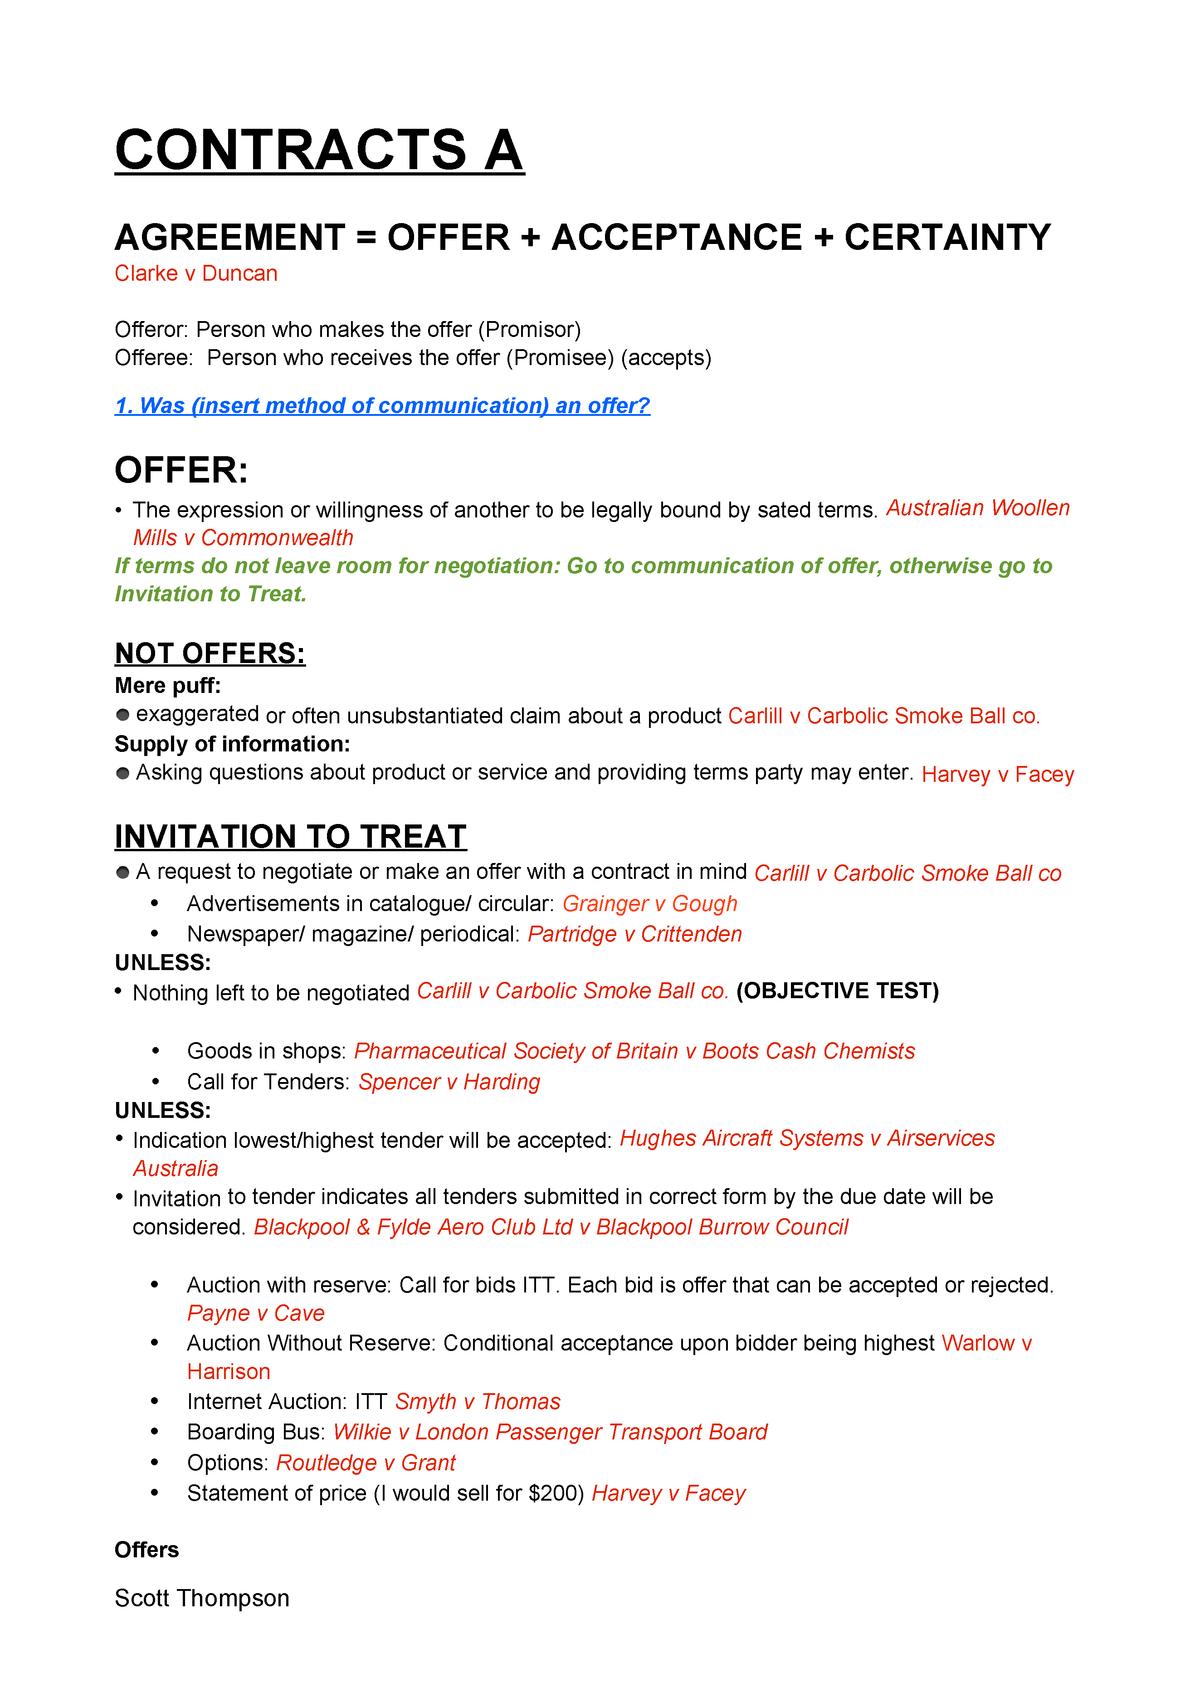 LLB202 Contract Exam Notes - StuDocu